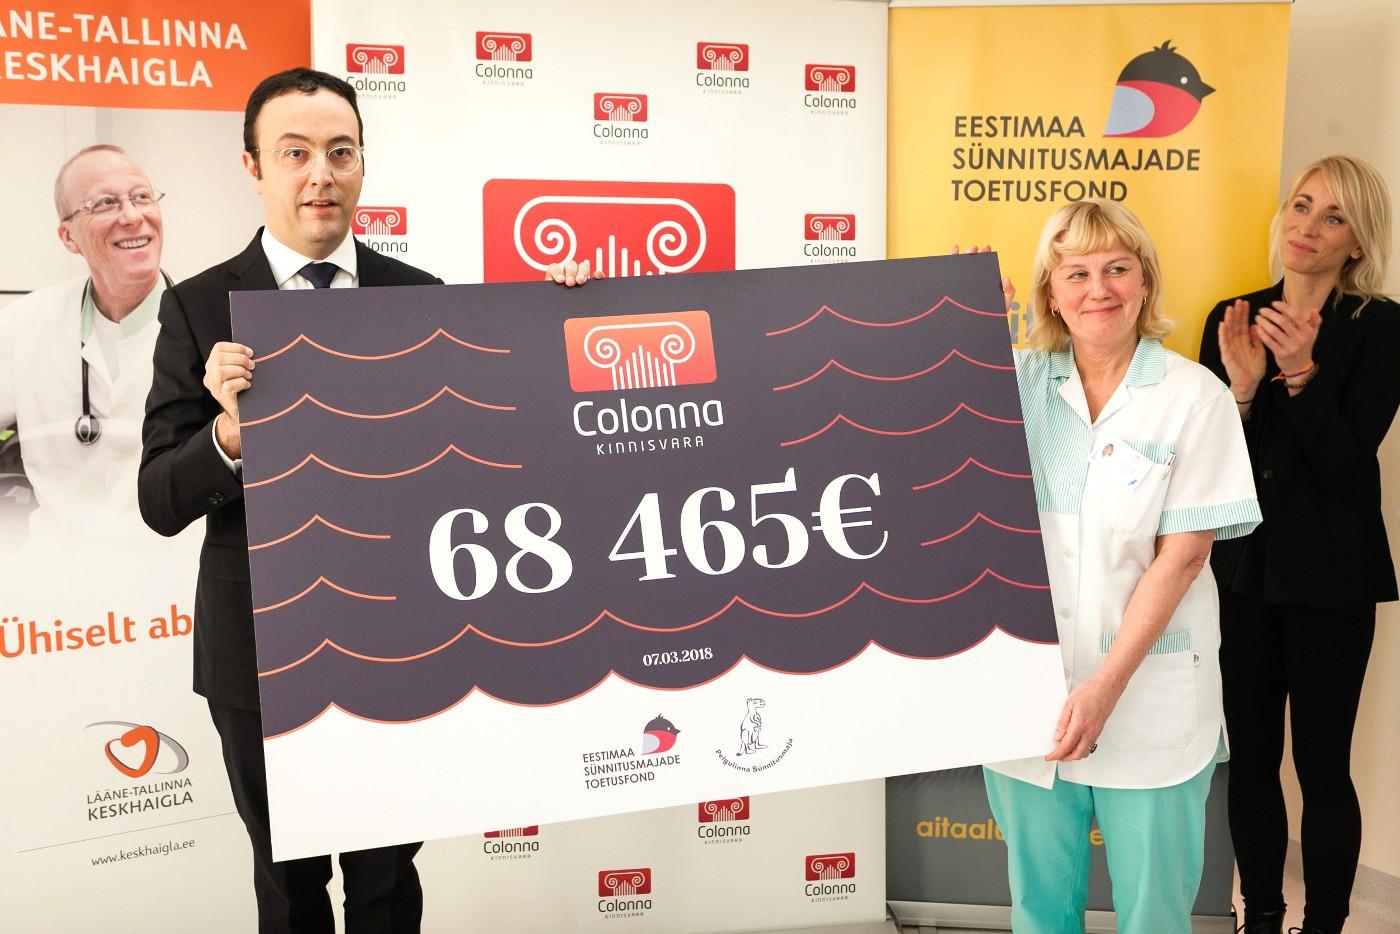 70 000 евро пожертвовано Пельгулиннаскому родильному дому